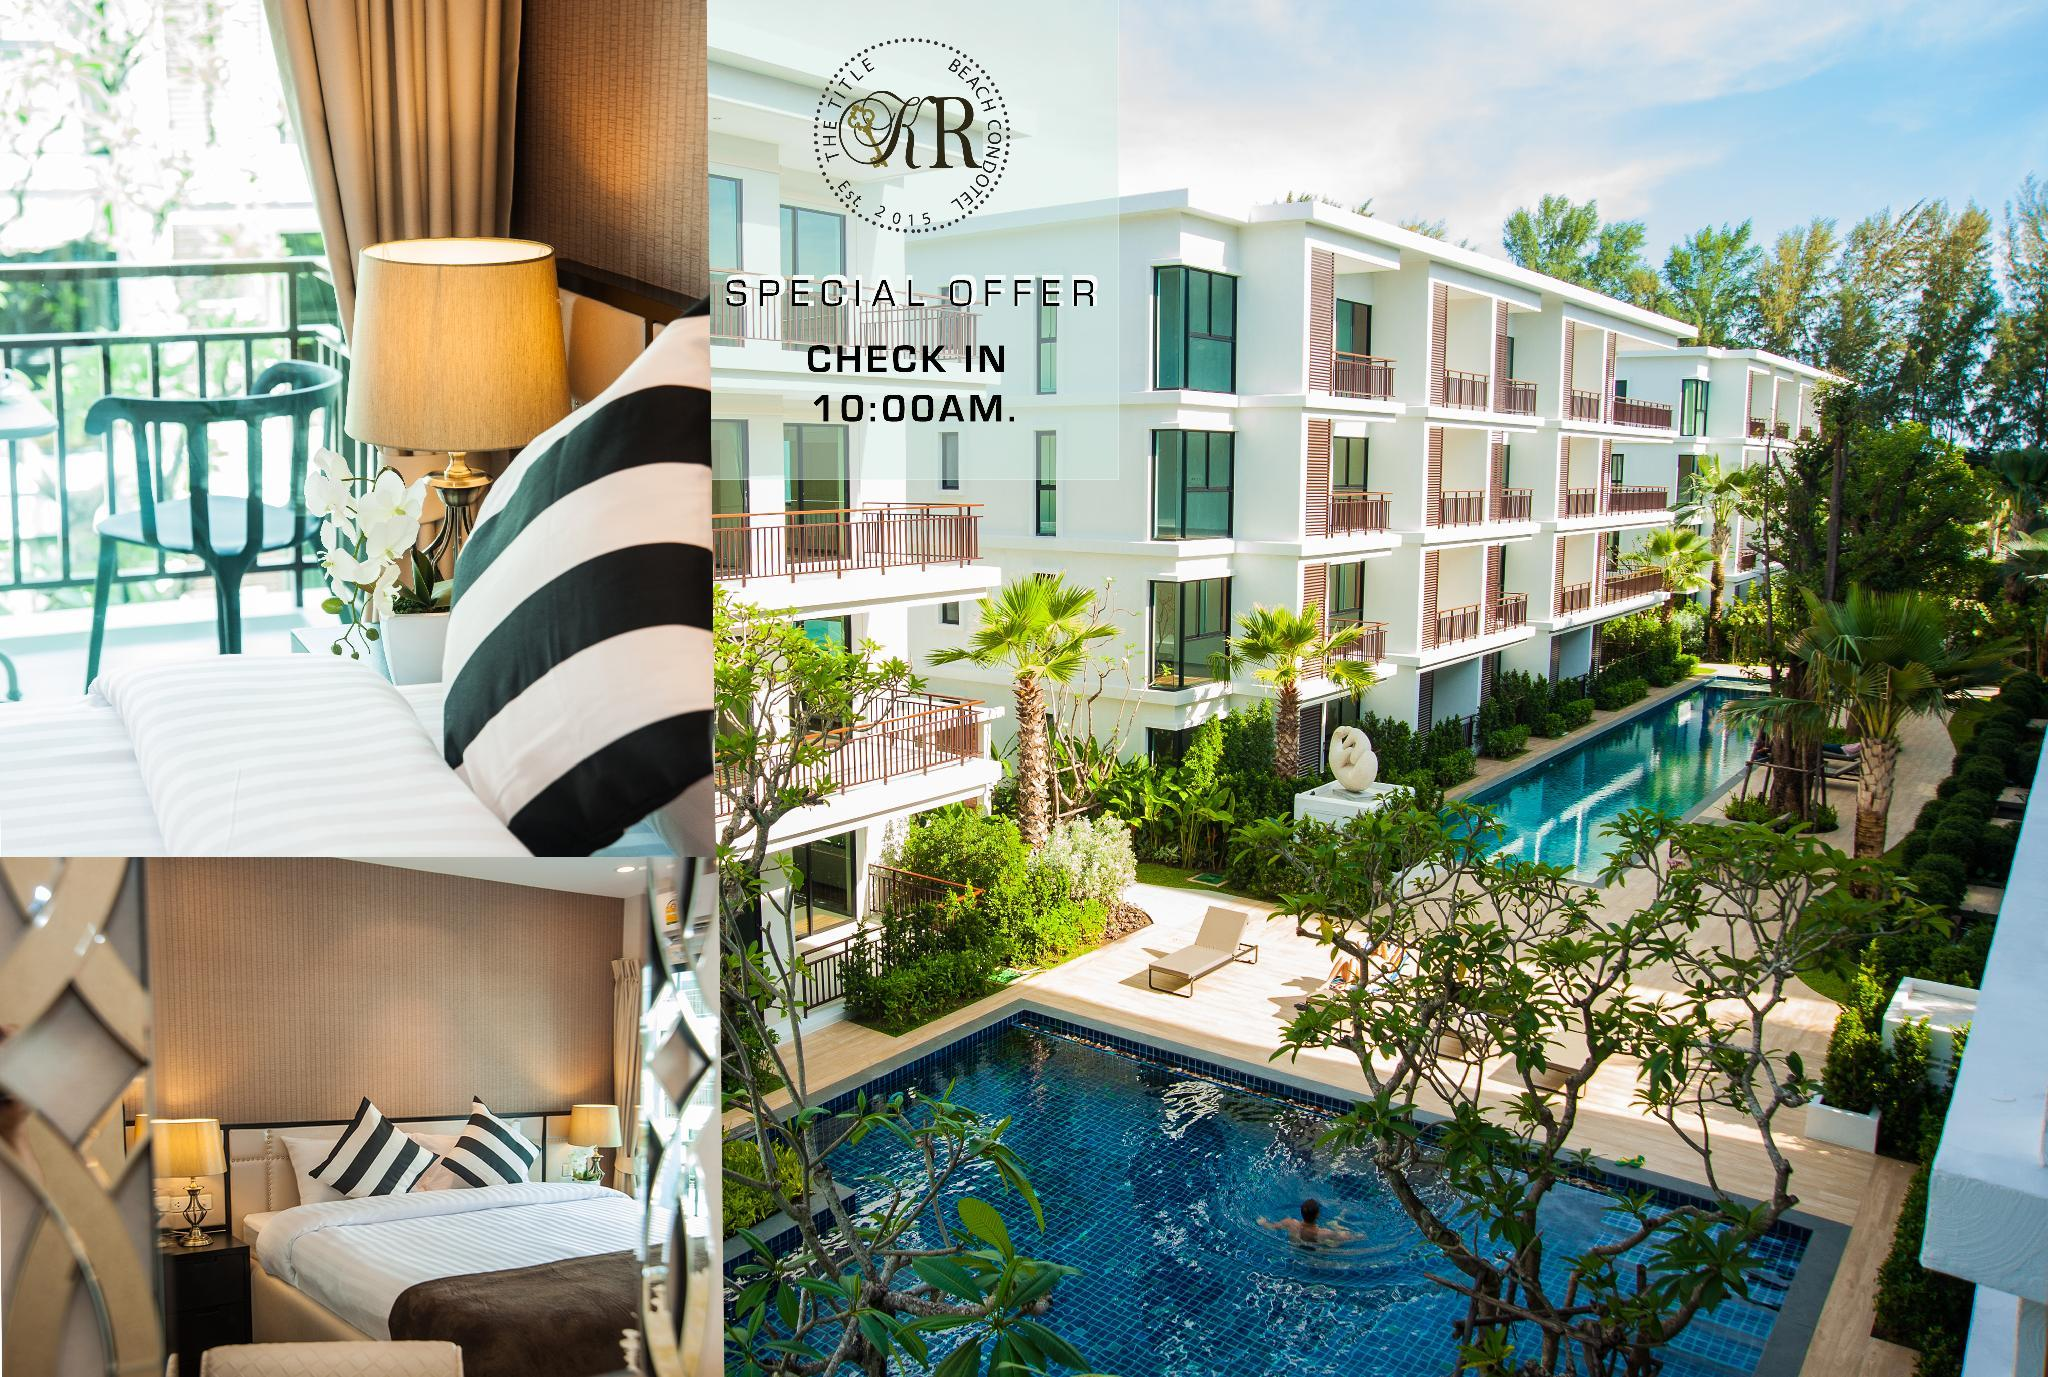 The Title KR Beach Condotel Rawai Phuket